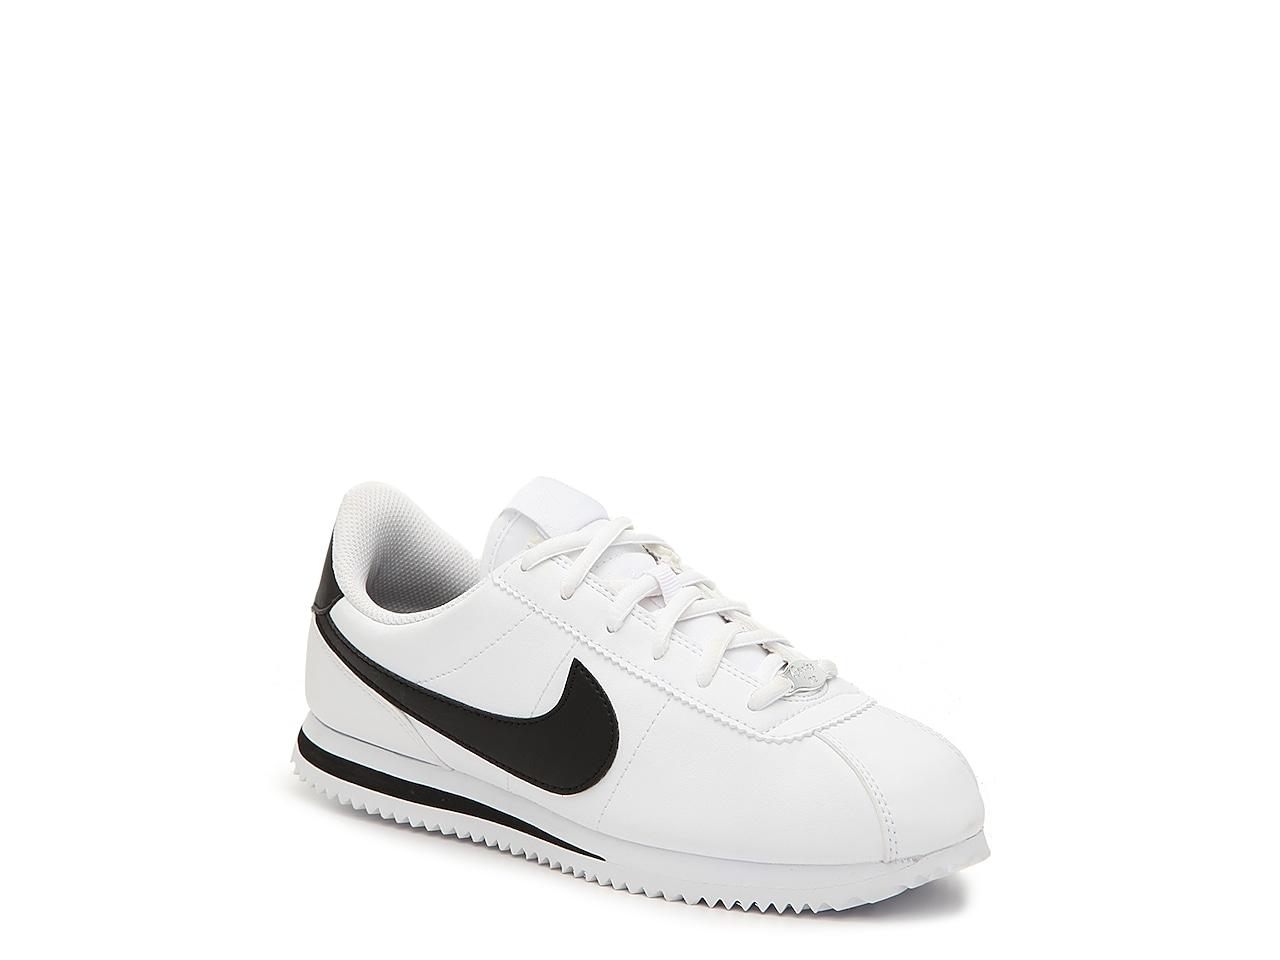 Visible Barón Costoso  Nike Cortez Sneaker - Kids' Kids Shoes | DSW